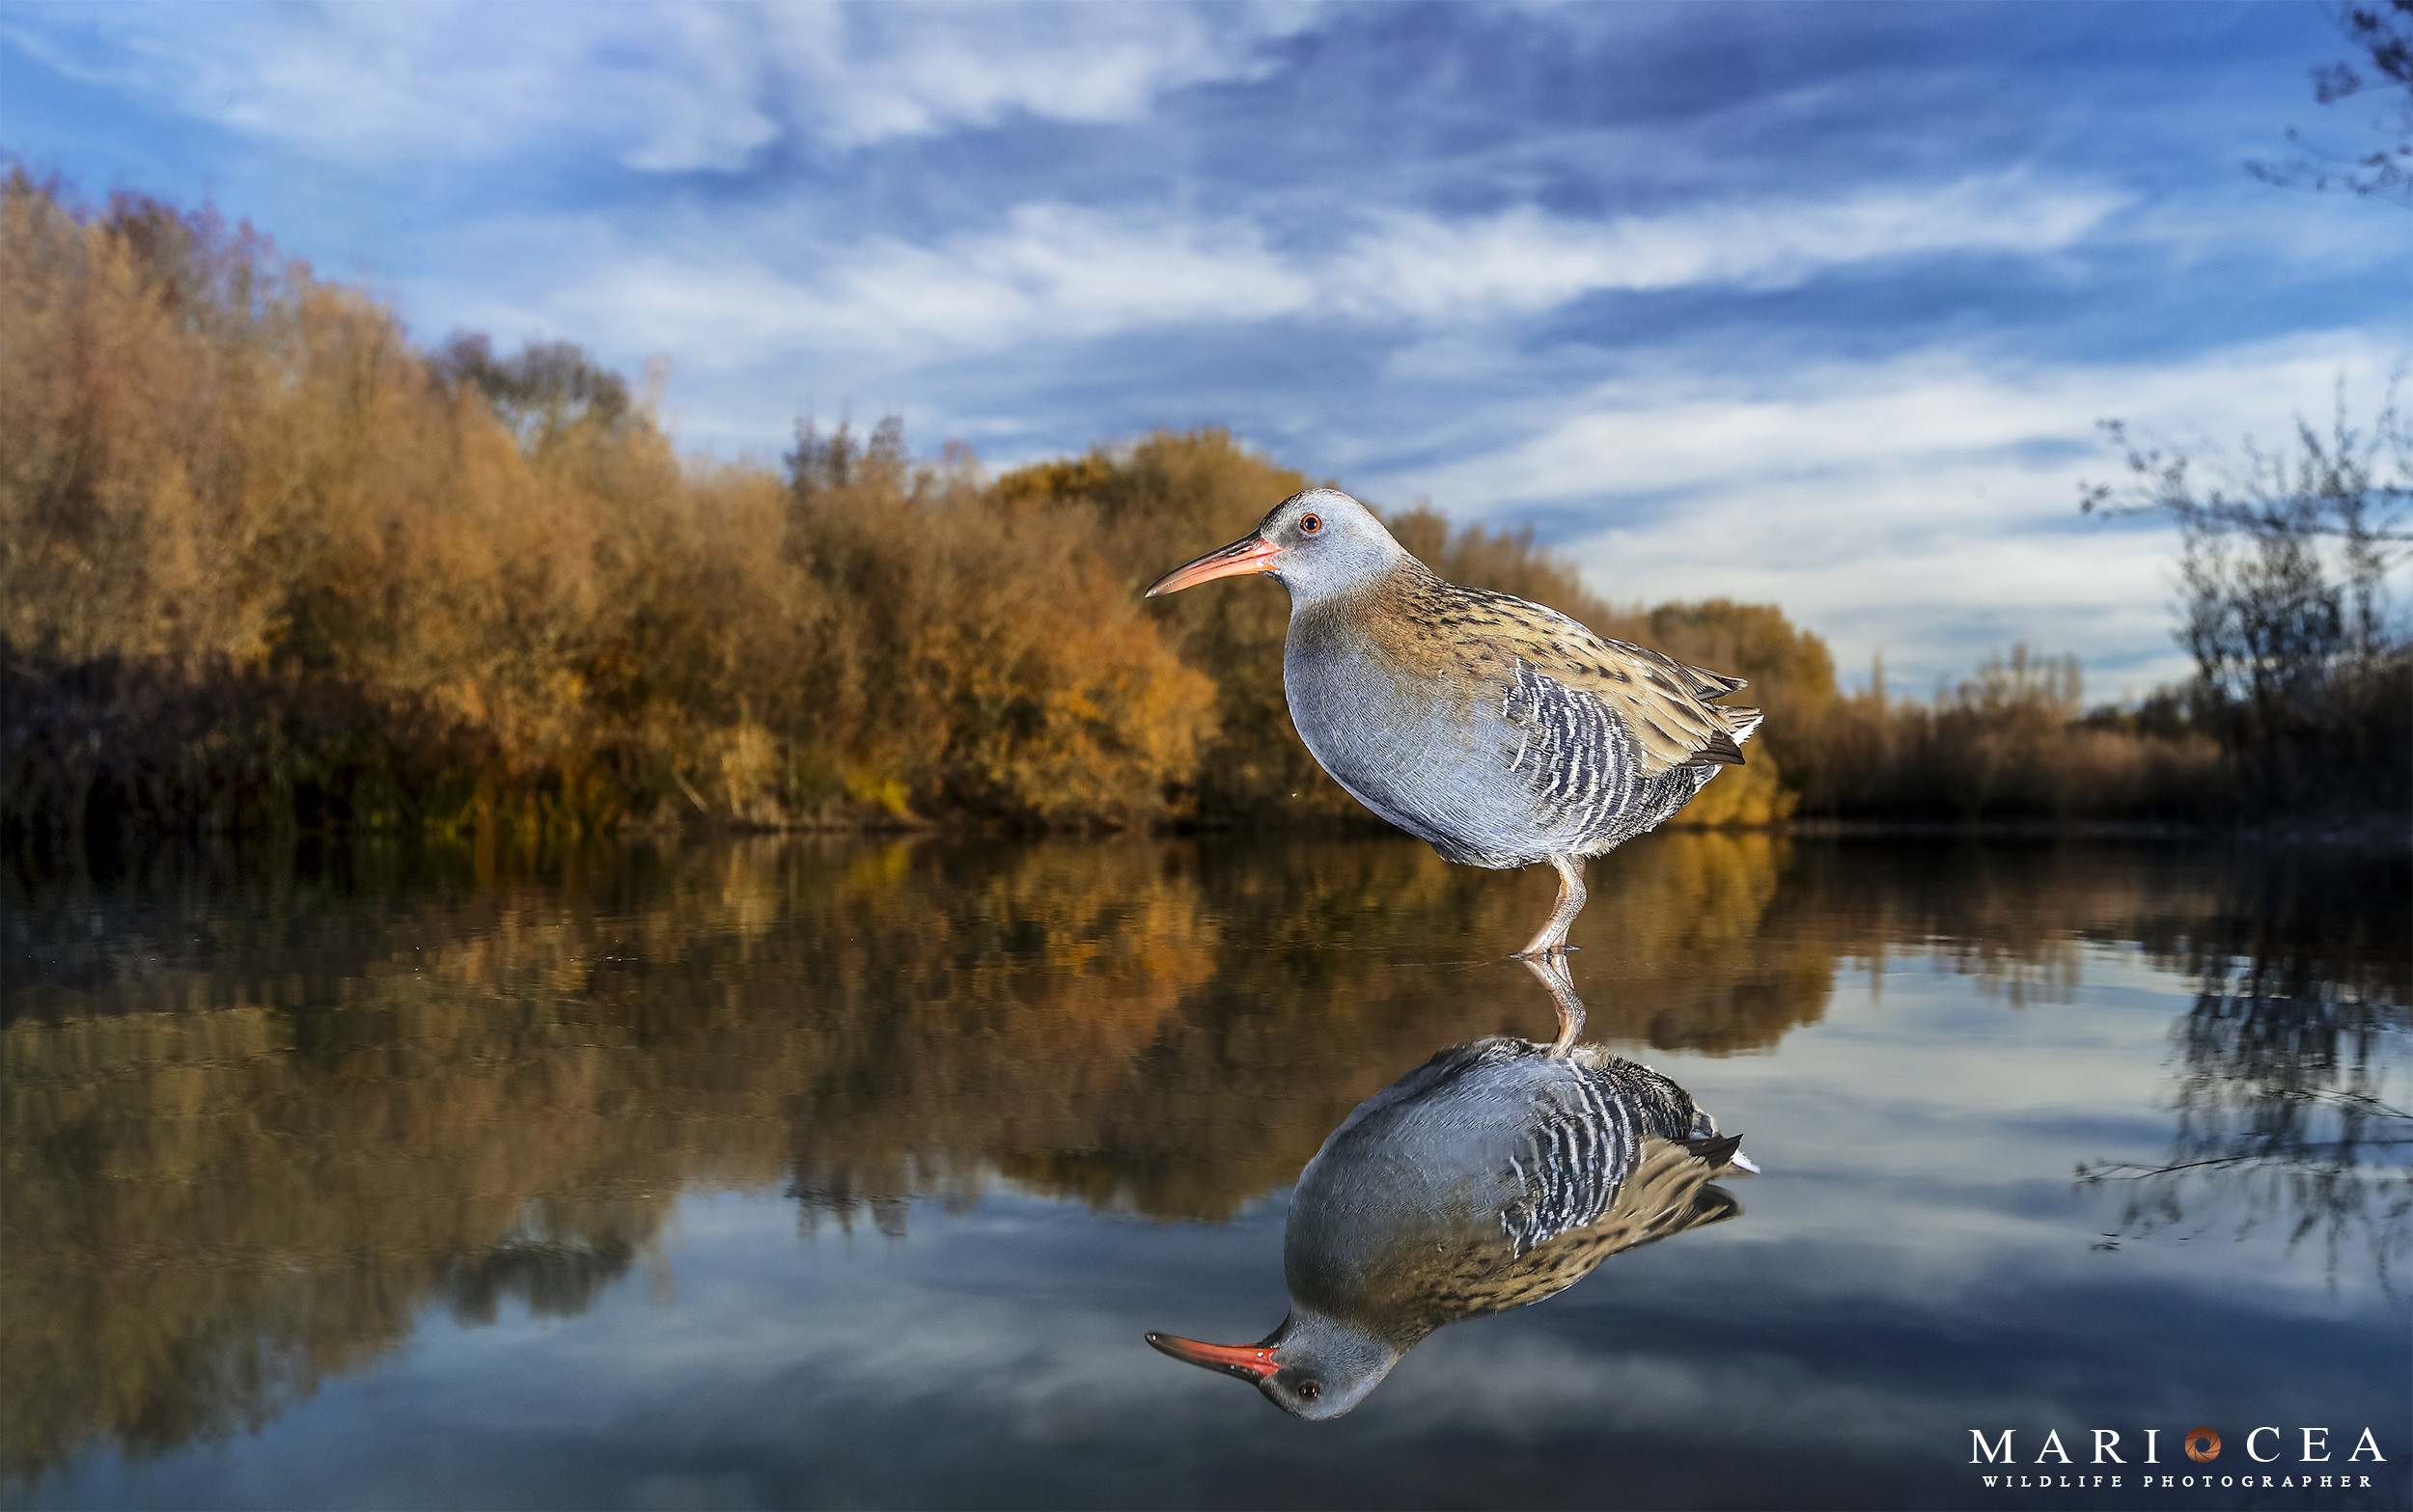 Foto de Fotografías de naturaleza tomadas por Mario Cea (12/12)